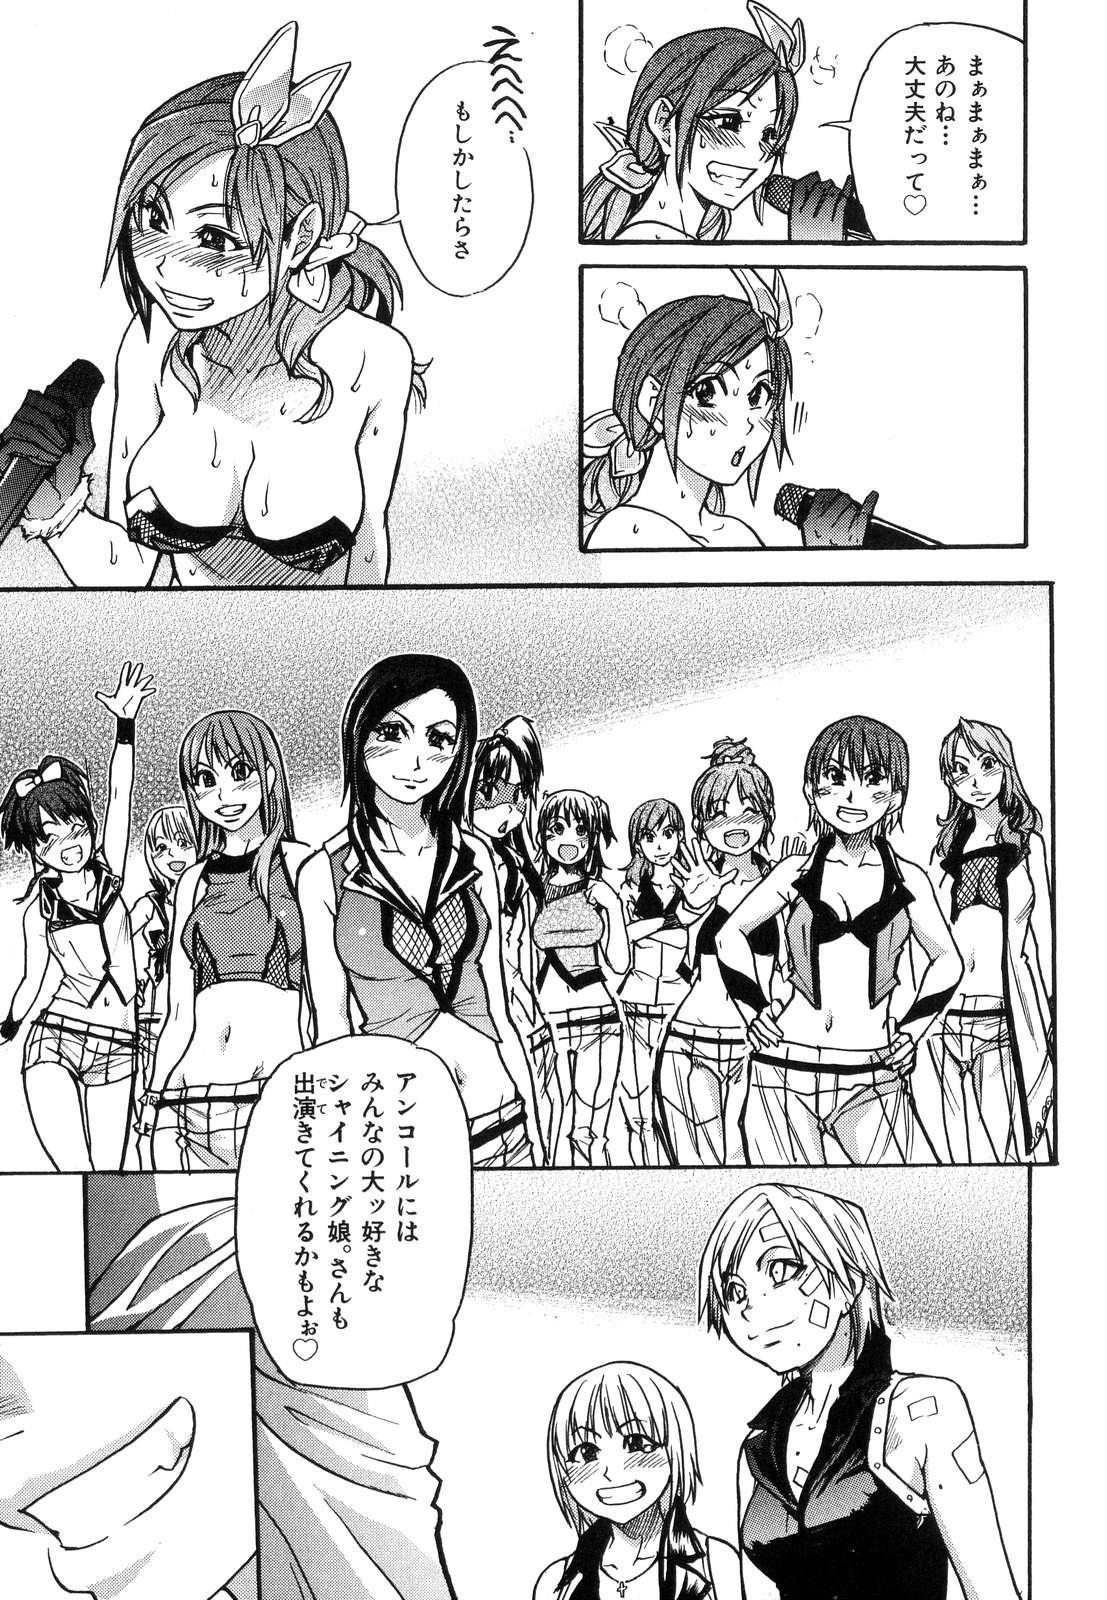 Shining Musume. 6. Rainbow Six 209